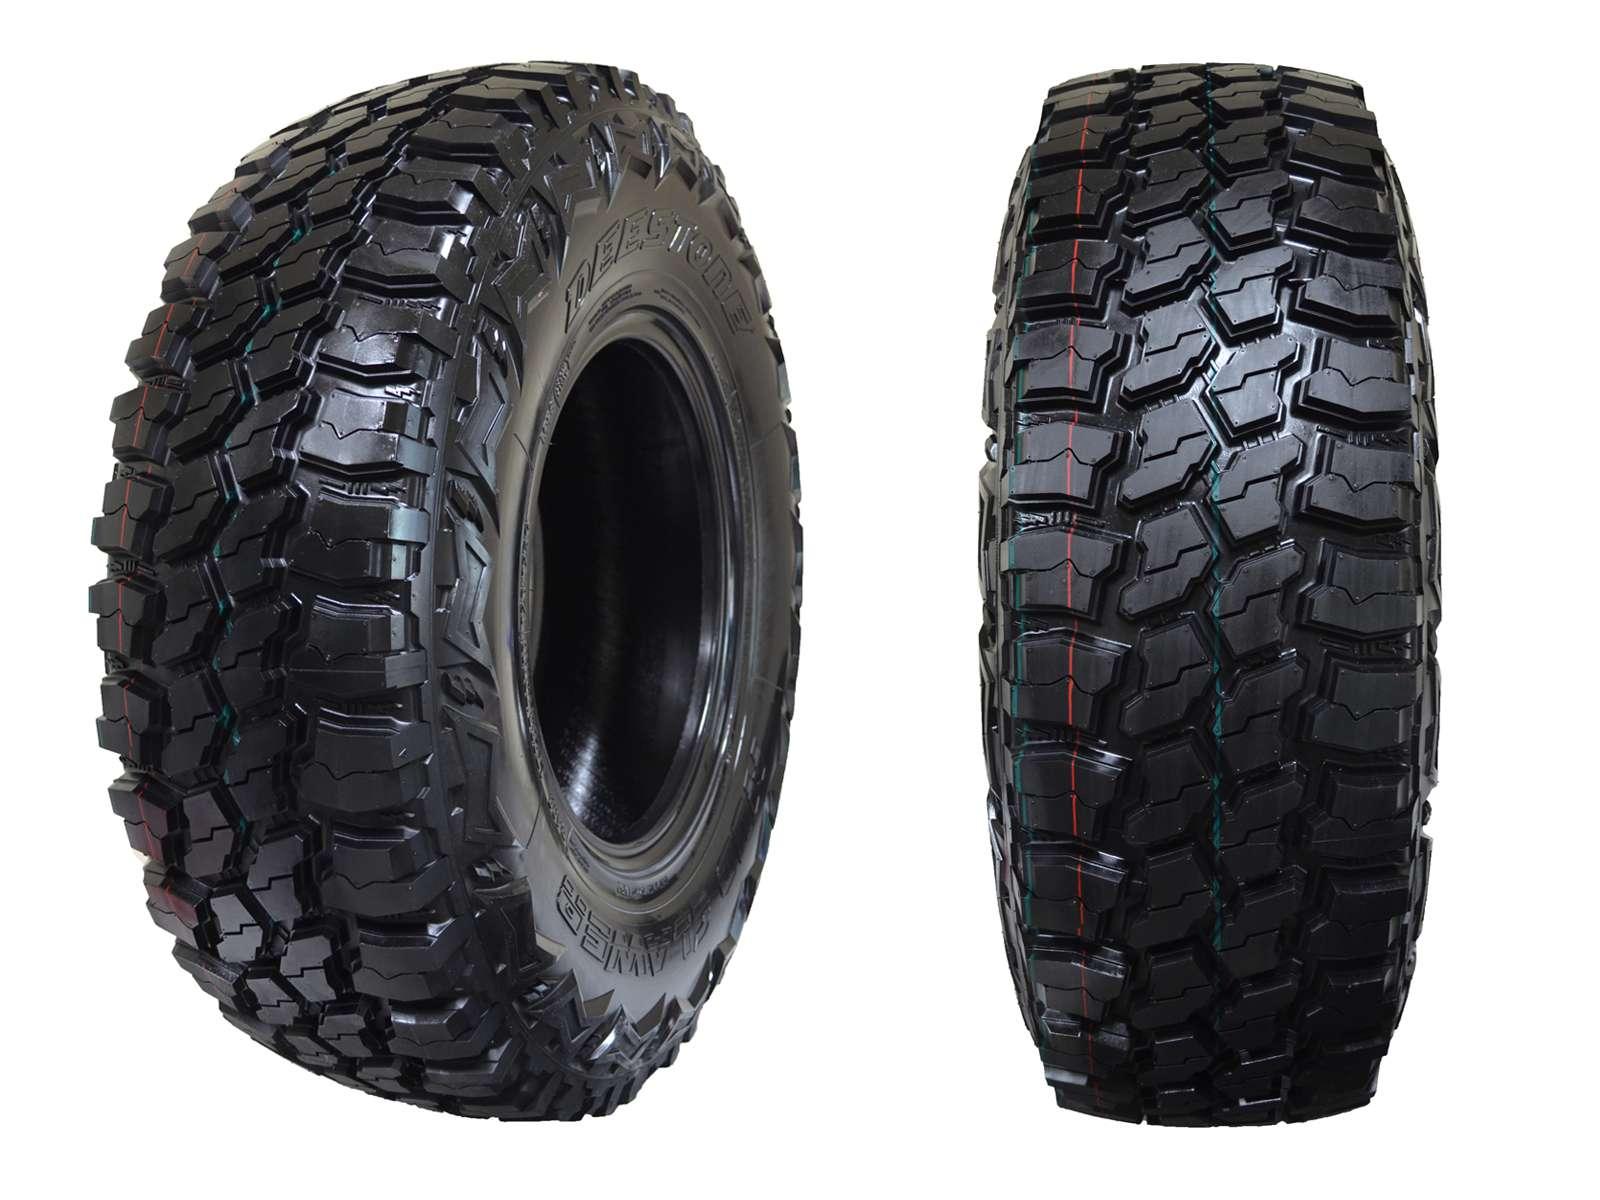 Mud Clawer R408 ยางออฟโร้ดสัญชาติไทย จาก Deestone